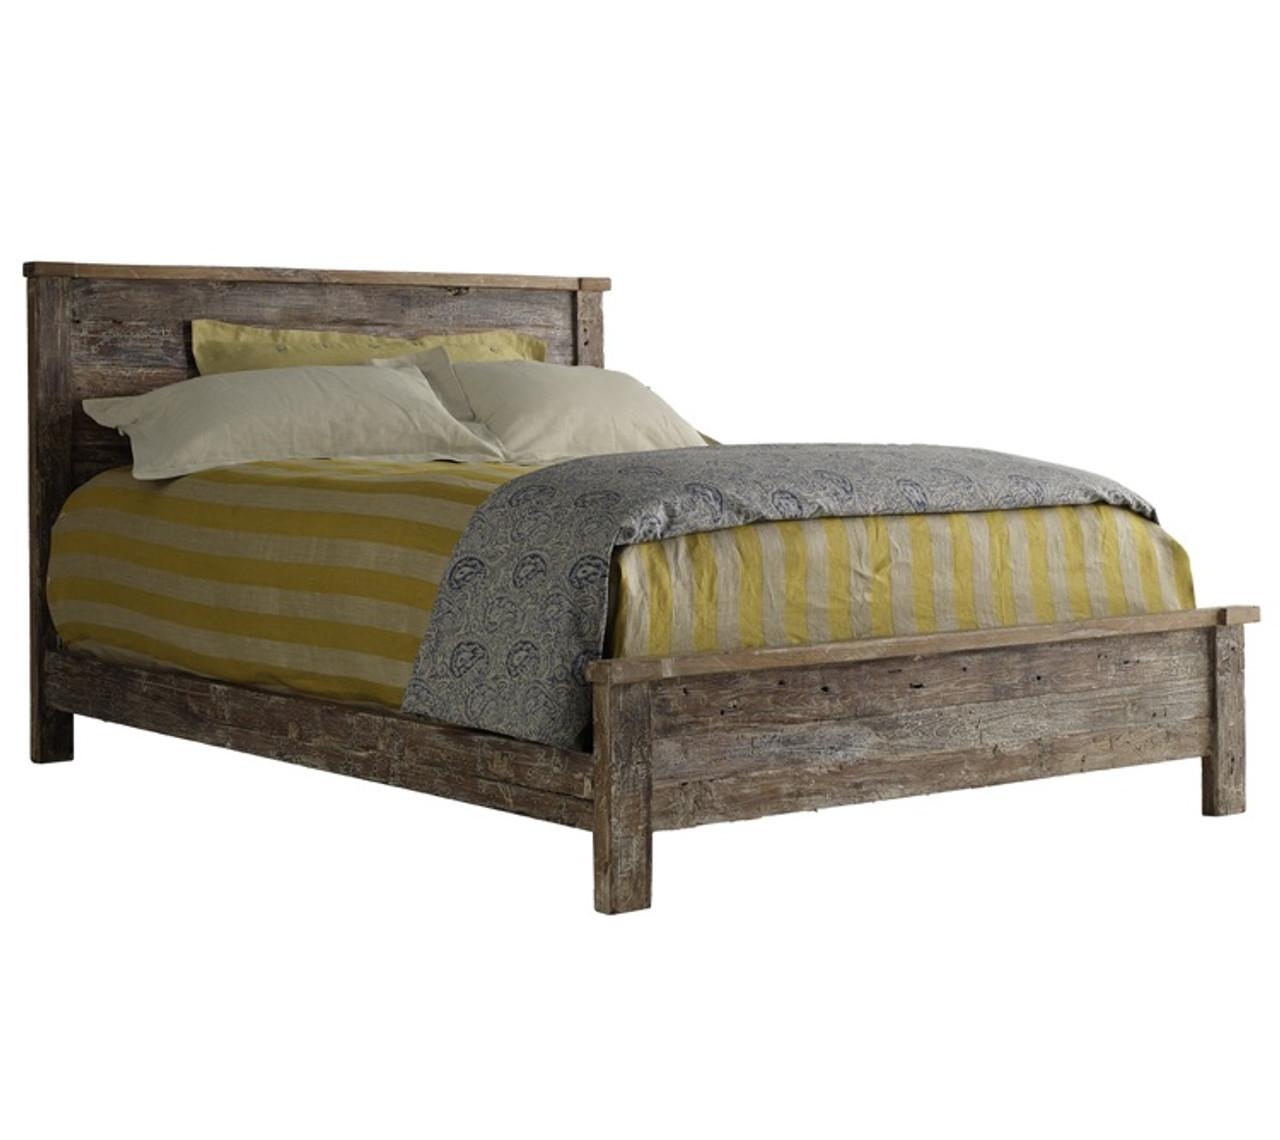 platform queen bed frame cheap frames for sale size with wood slat rustic teak